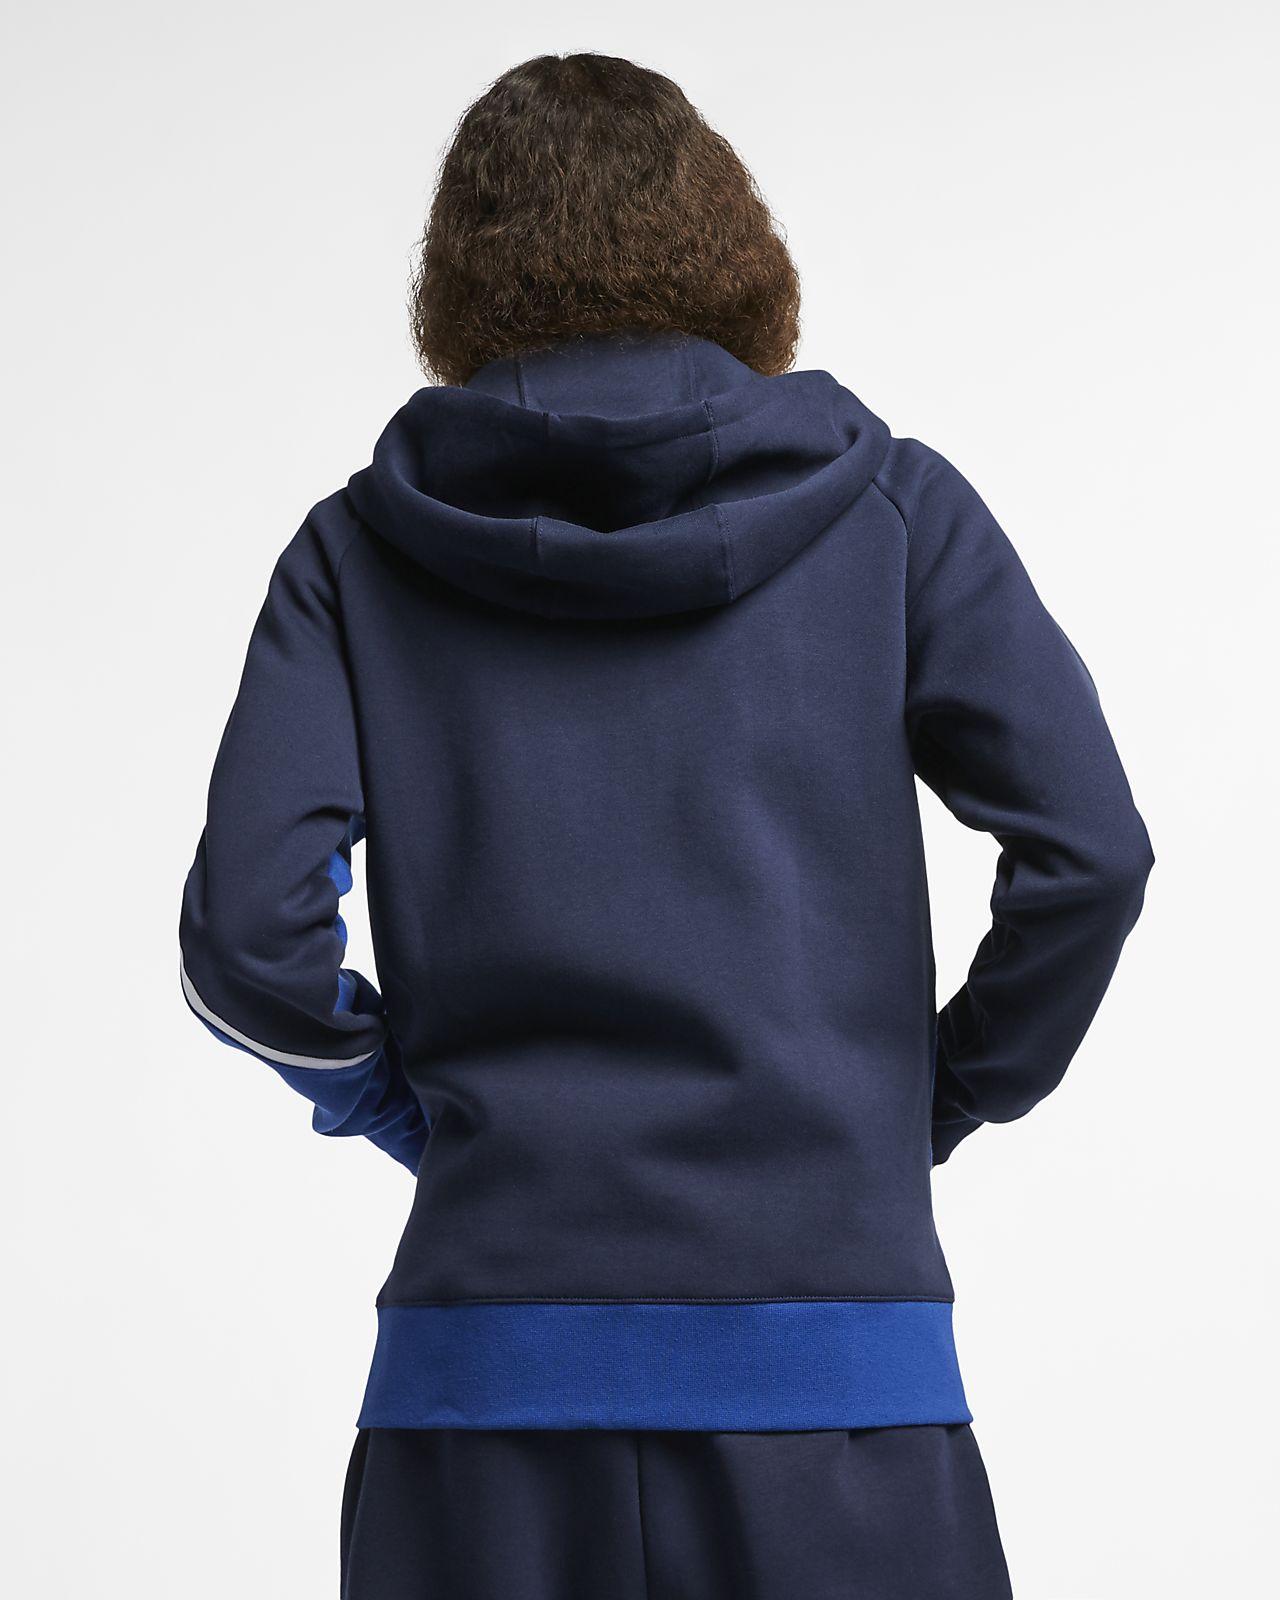 f3a74062b757 Ανδρική μπλούζα με κουκούλα και φερμουάρ Nike Sportswear. Nike.com GR